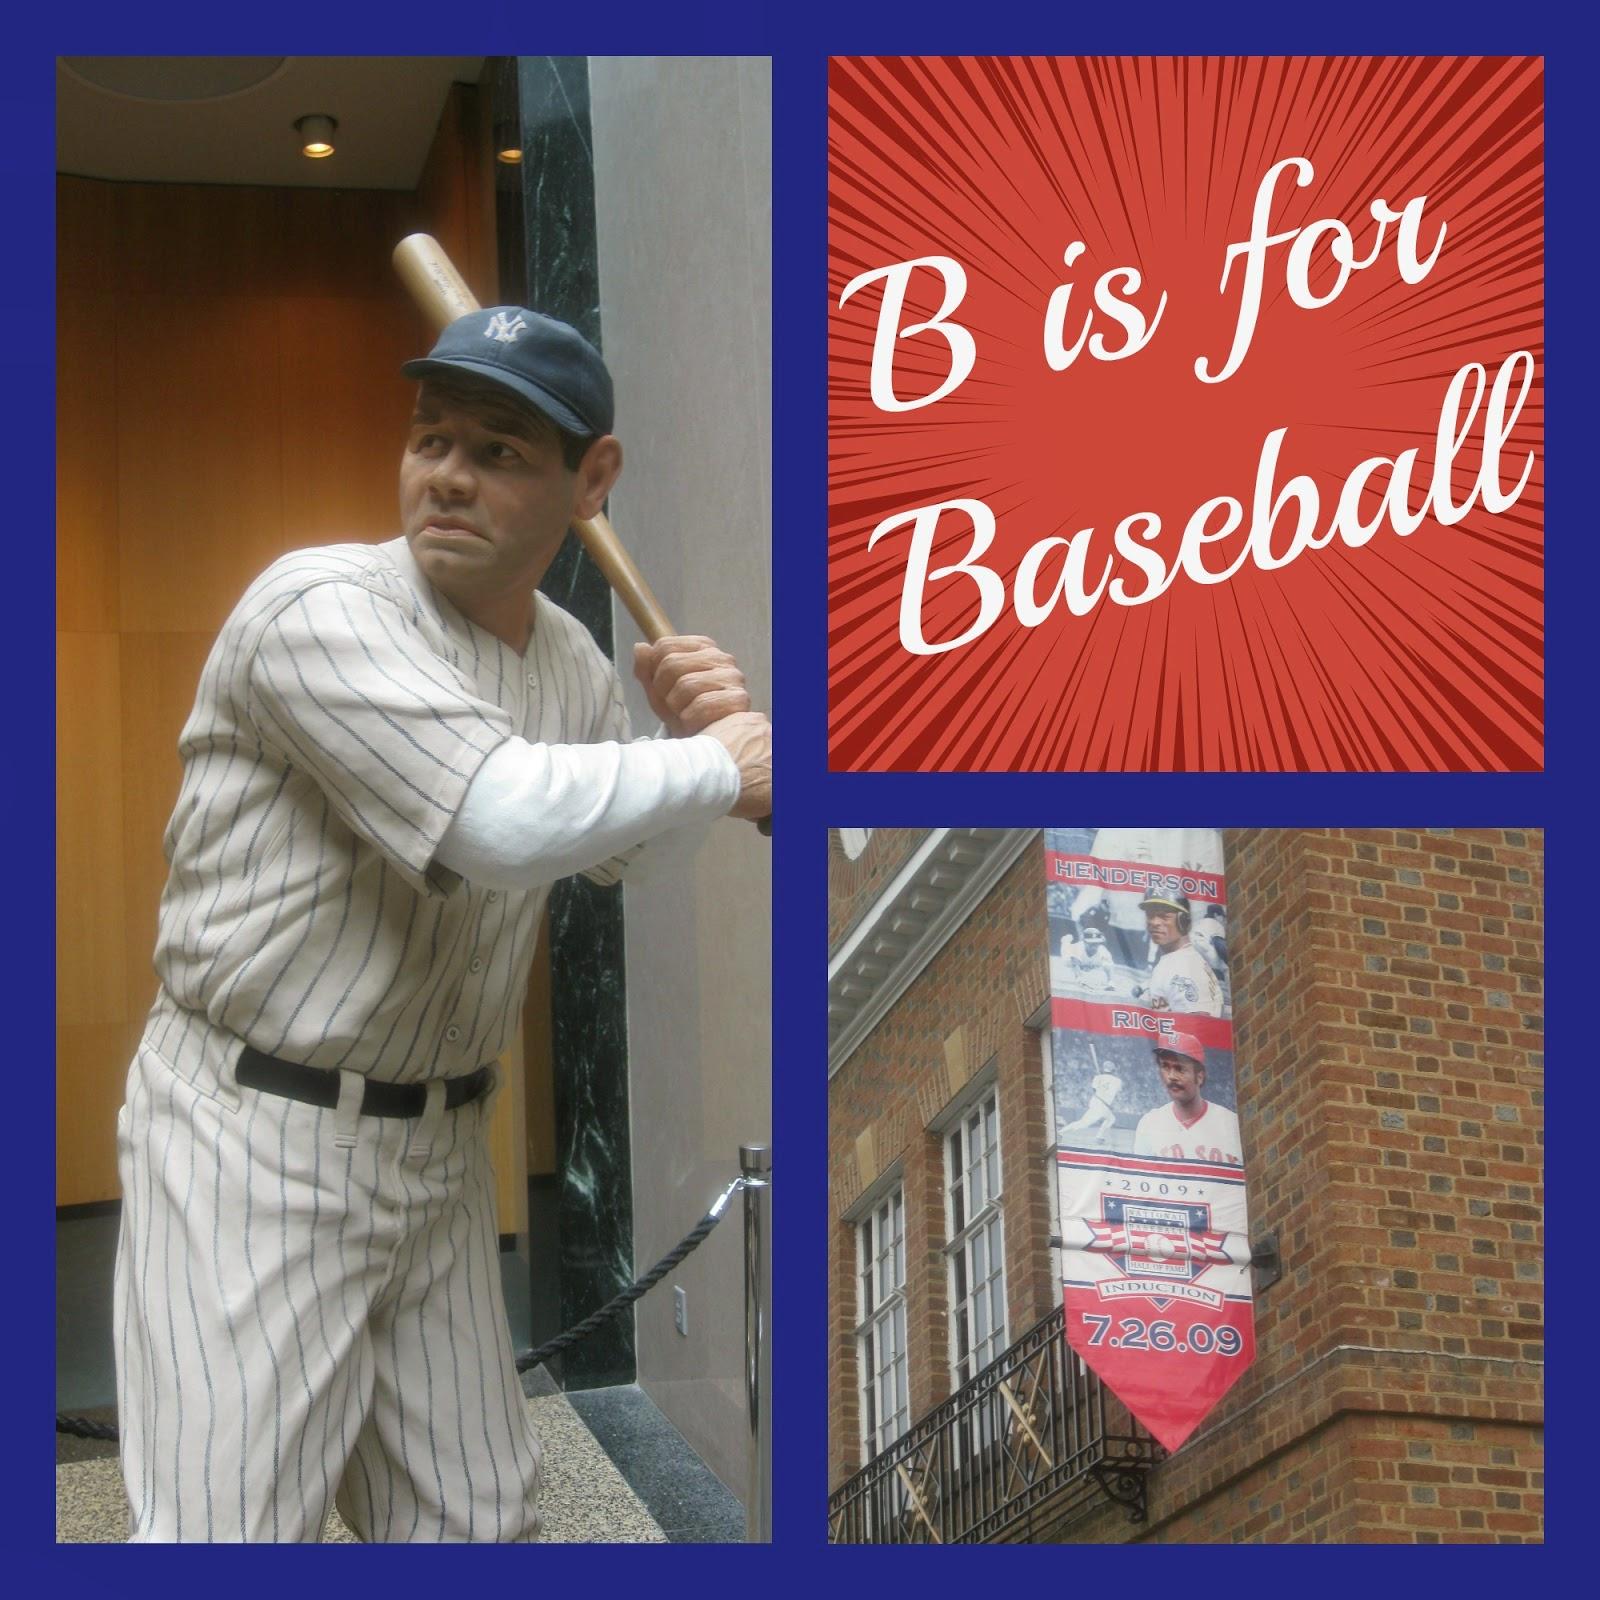 B is for Baseball (History Lesson) on Homeschool Coffee Break @ kympossibleblog.blogspot.com